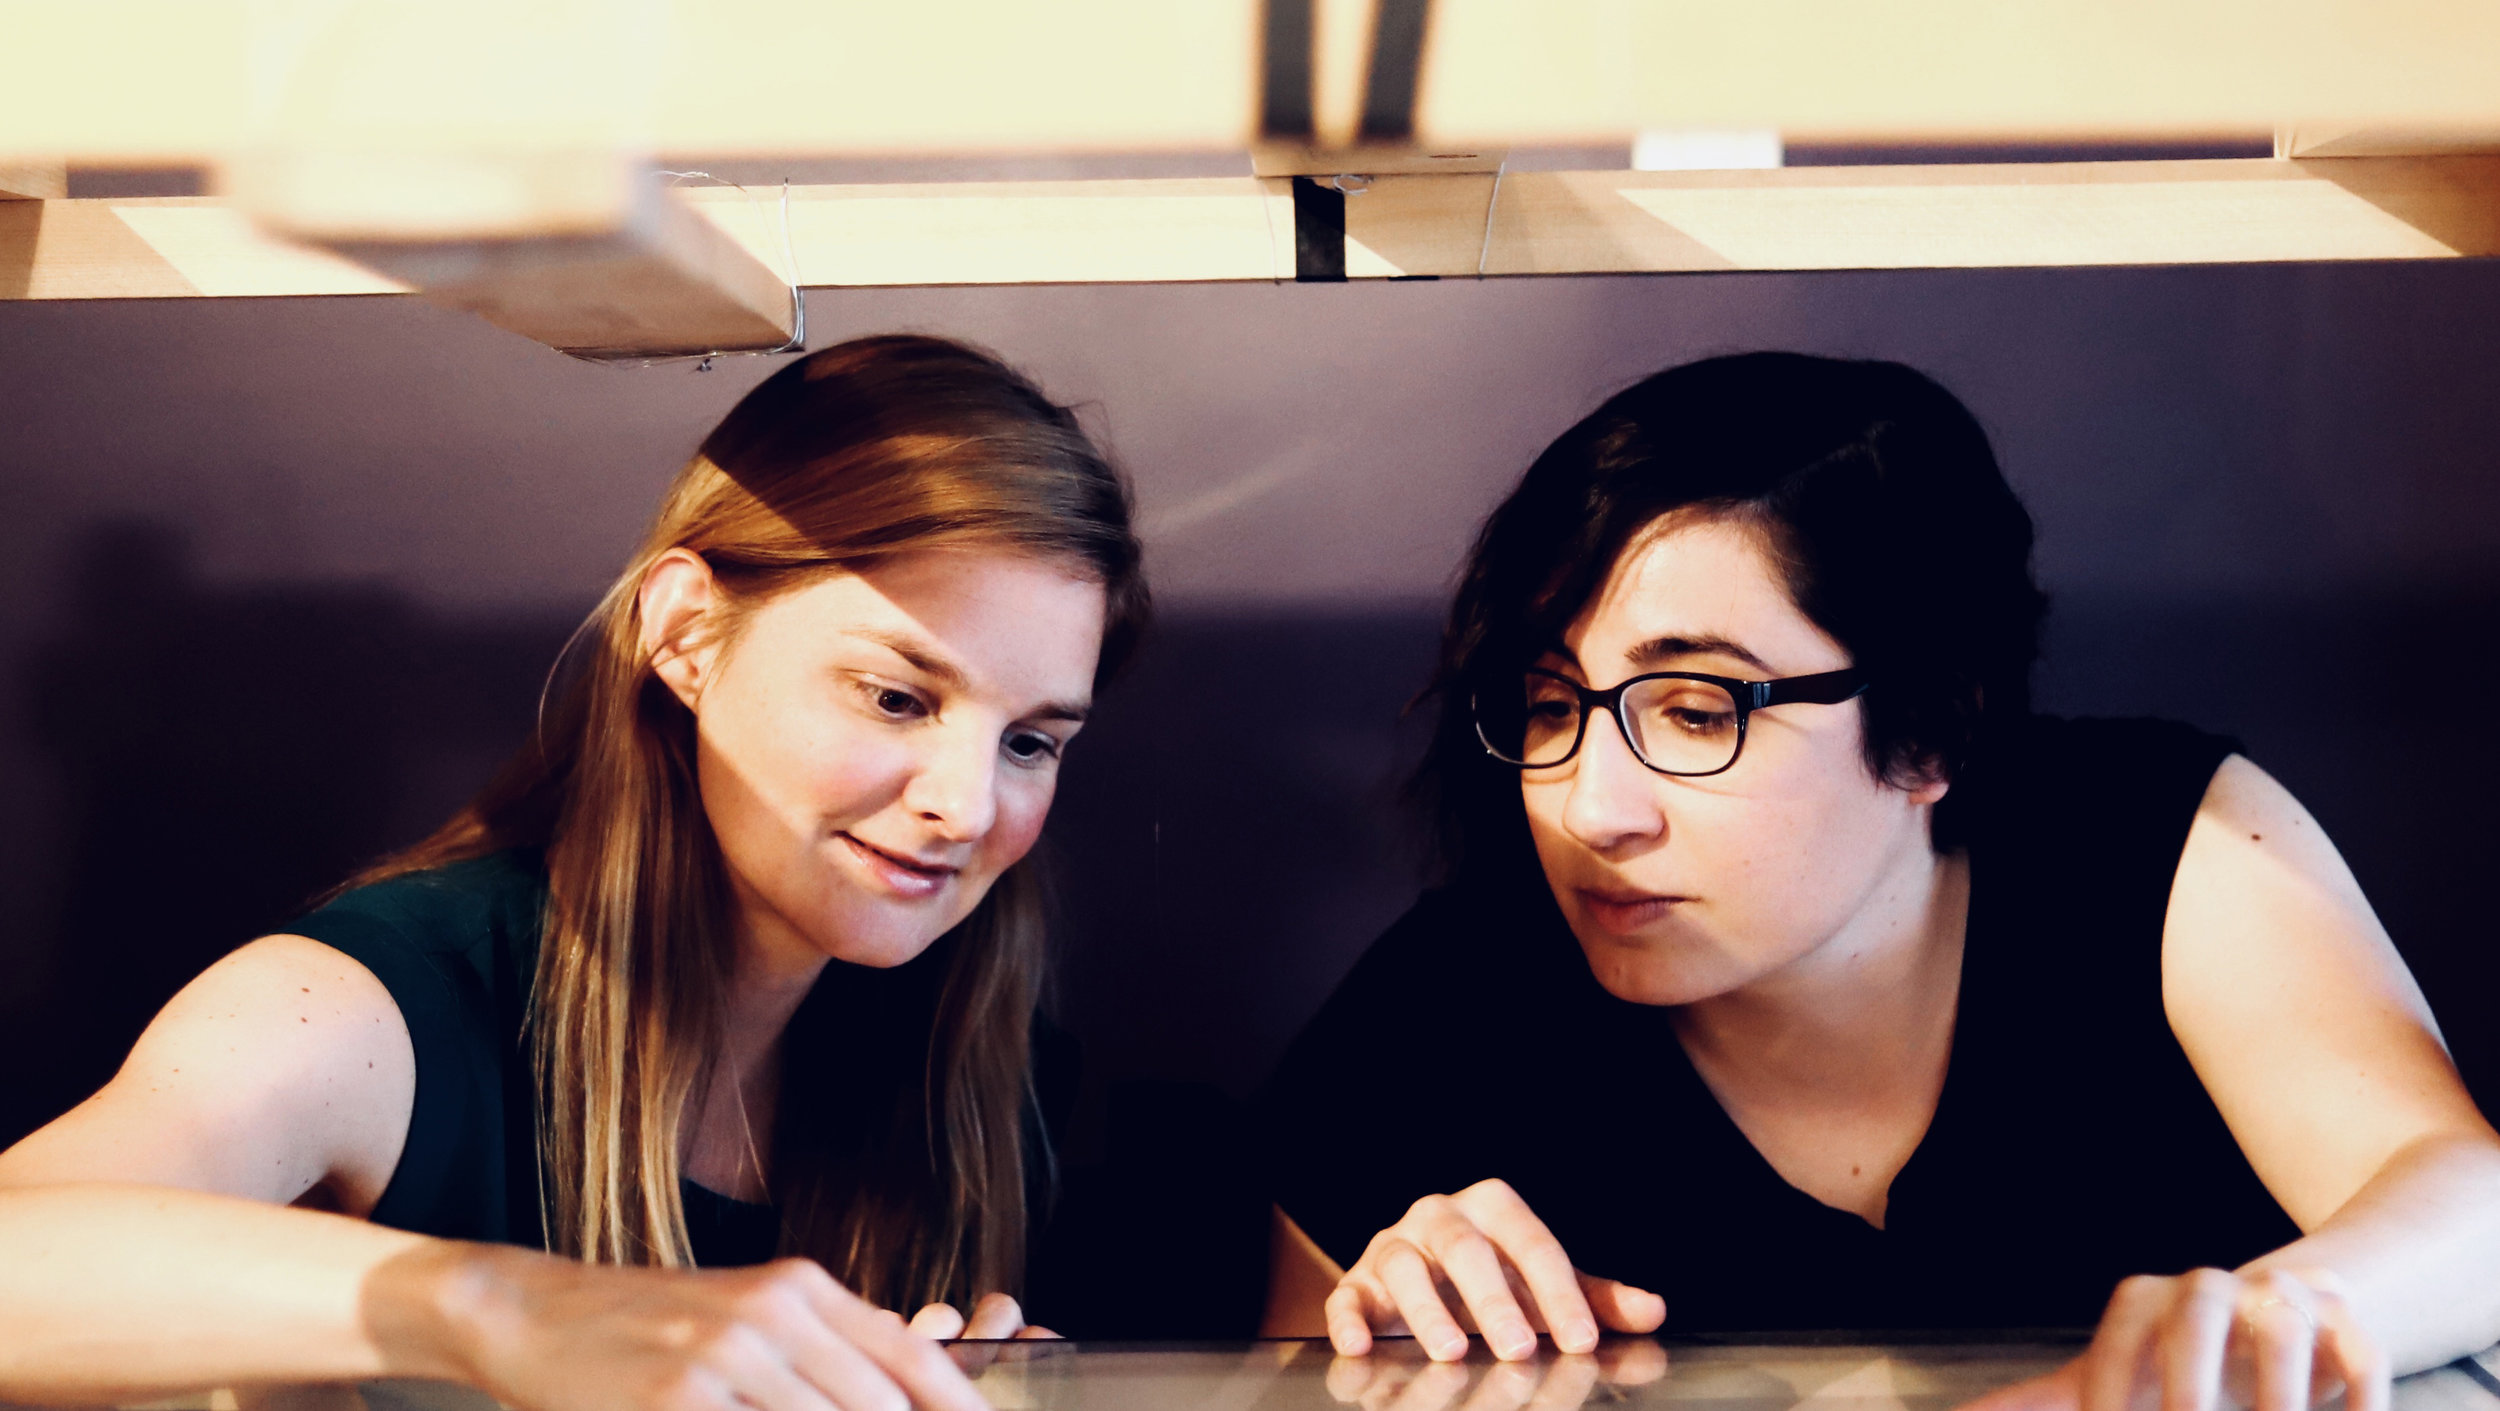 Elizabeth Beecherl and Carla Patullo working on Trick Studio's multiplane camera.